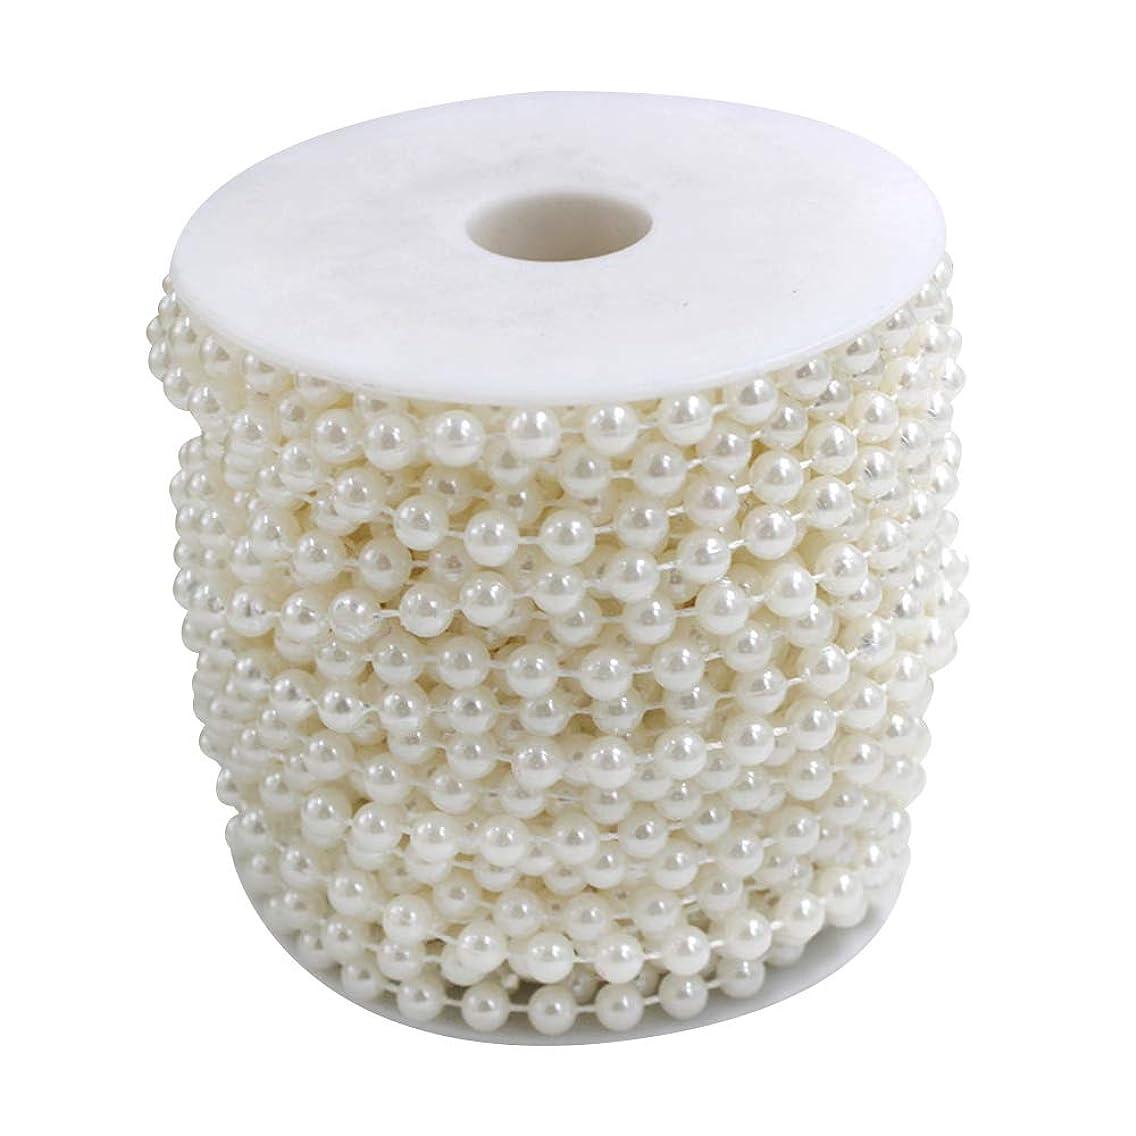 Wispun 6mm Pearl Bead Garland Spool Rope Wedding Centerpiece Decor 20M=65ft (white)